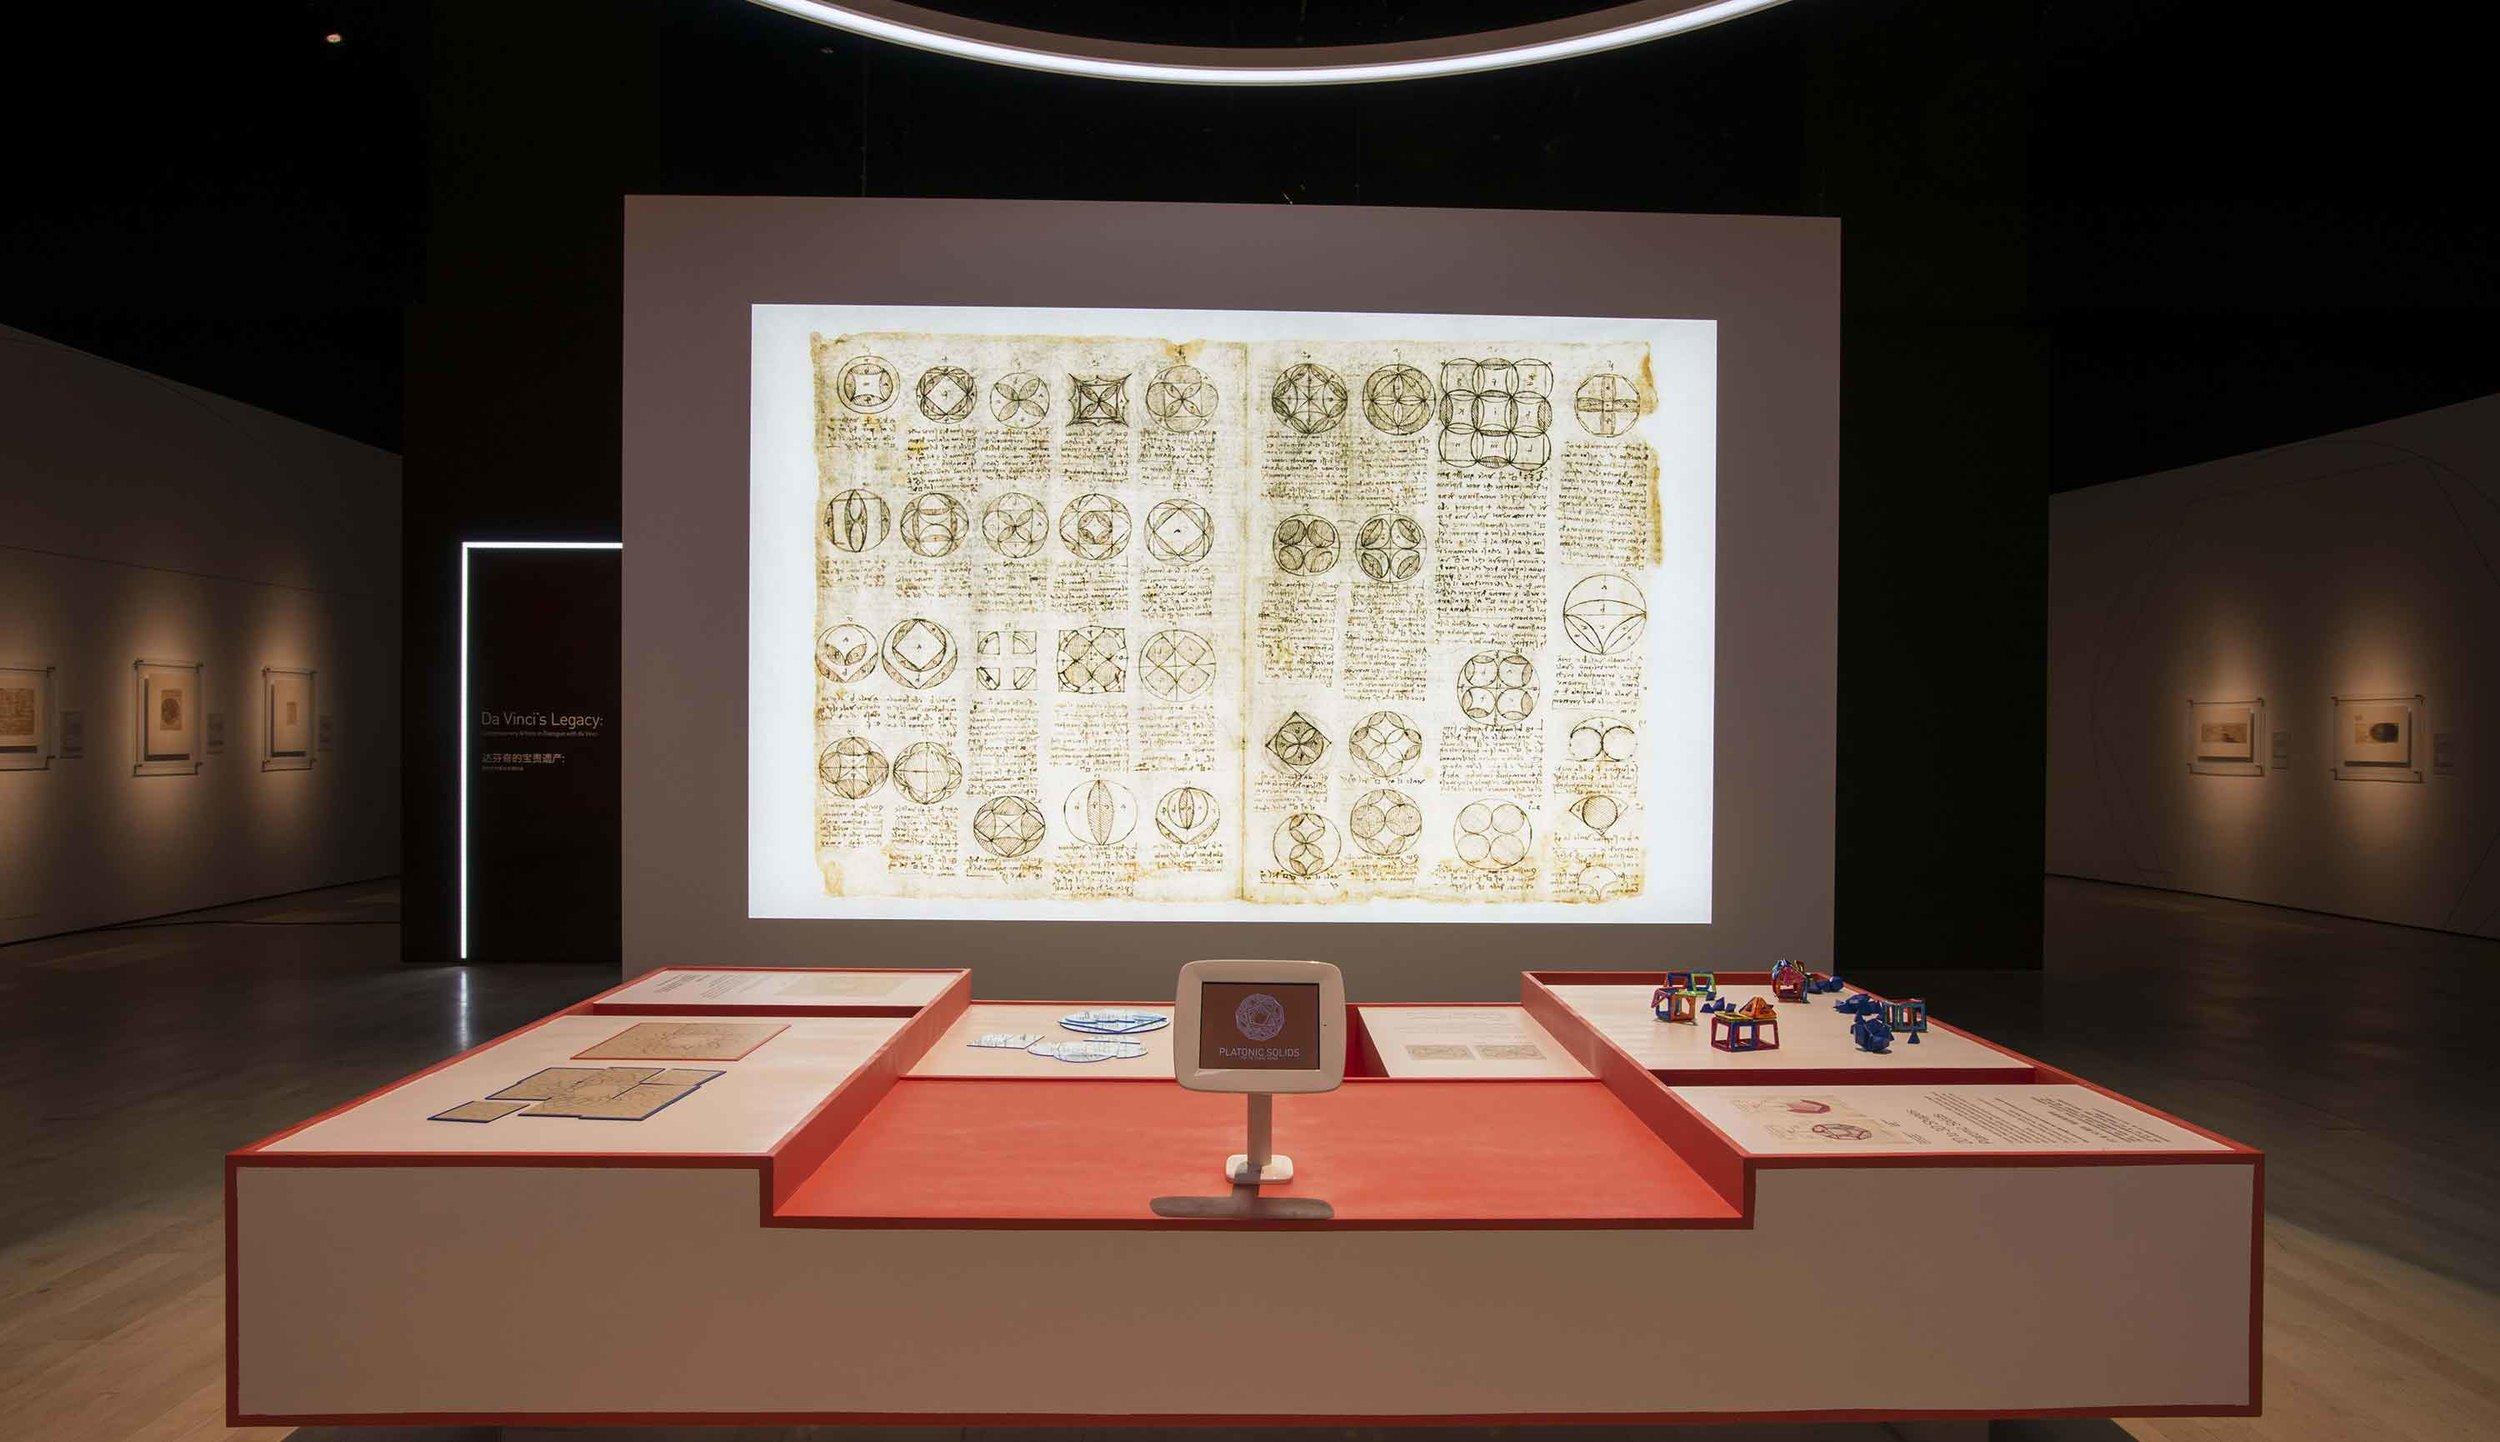 davinci-exhibit-mathematics-straight-image-gallery.jpg